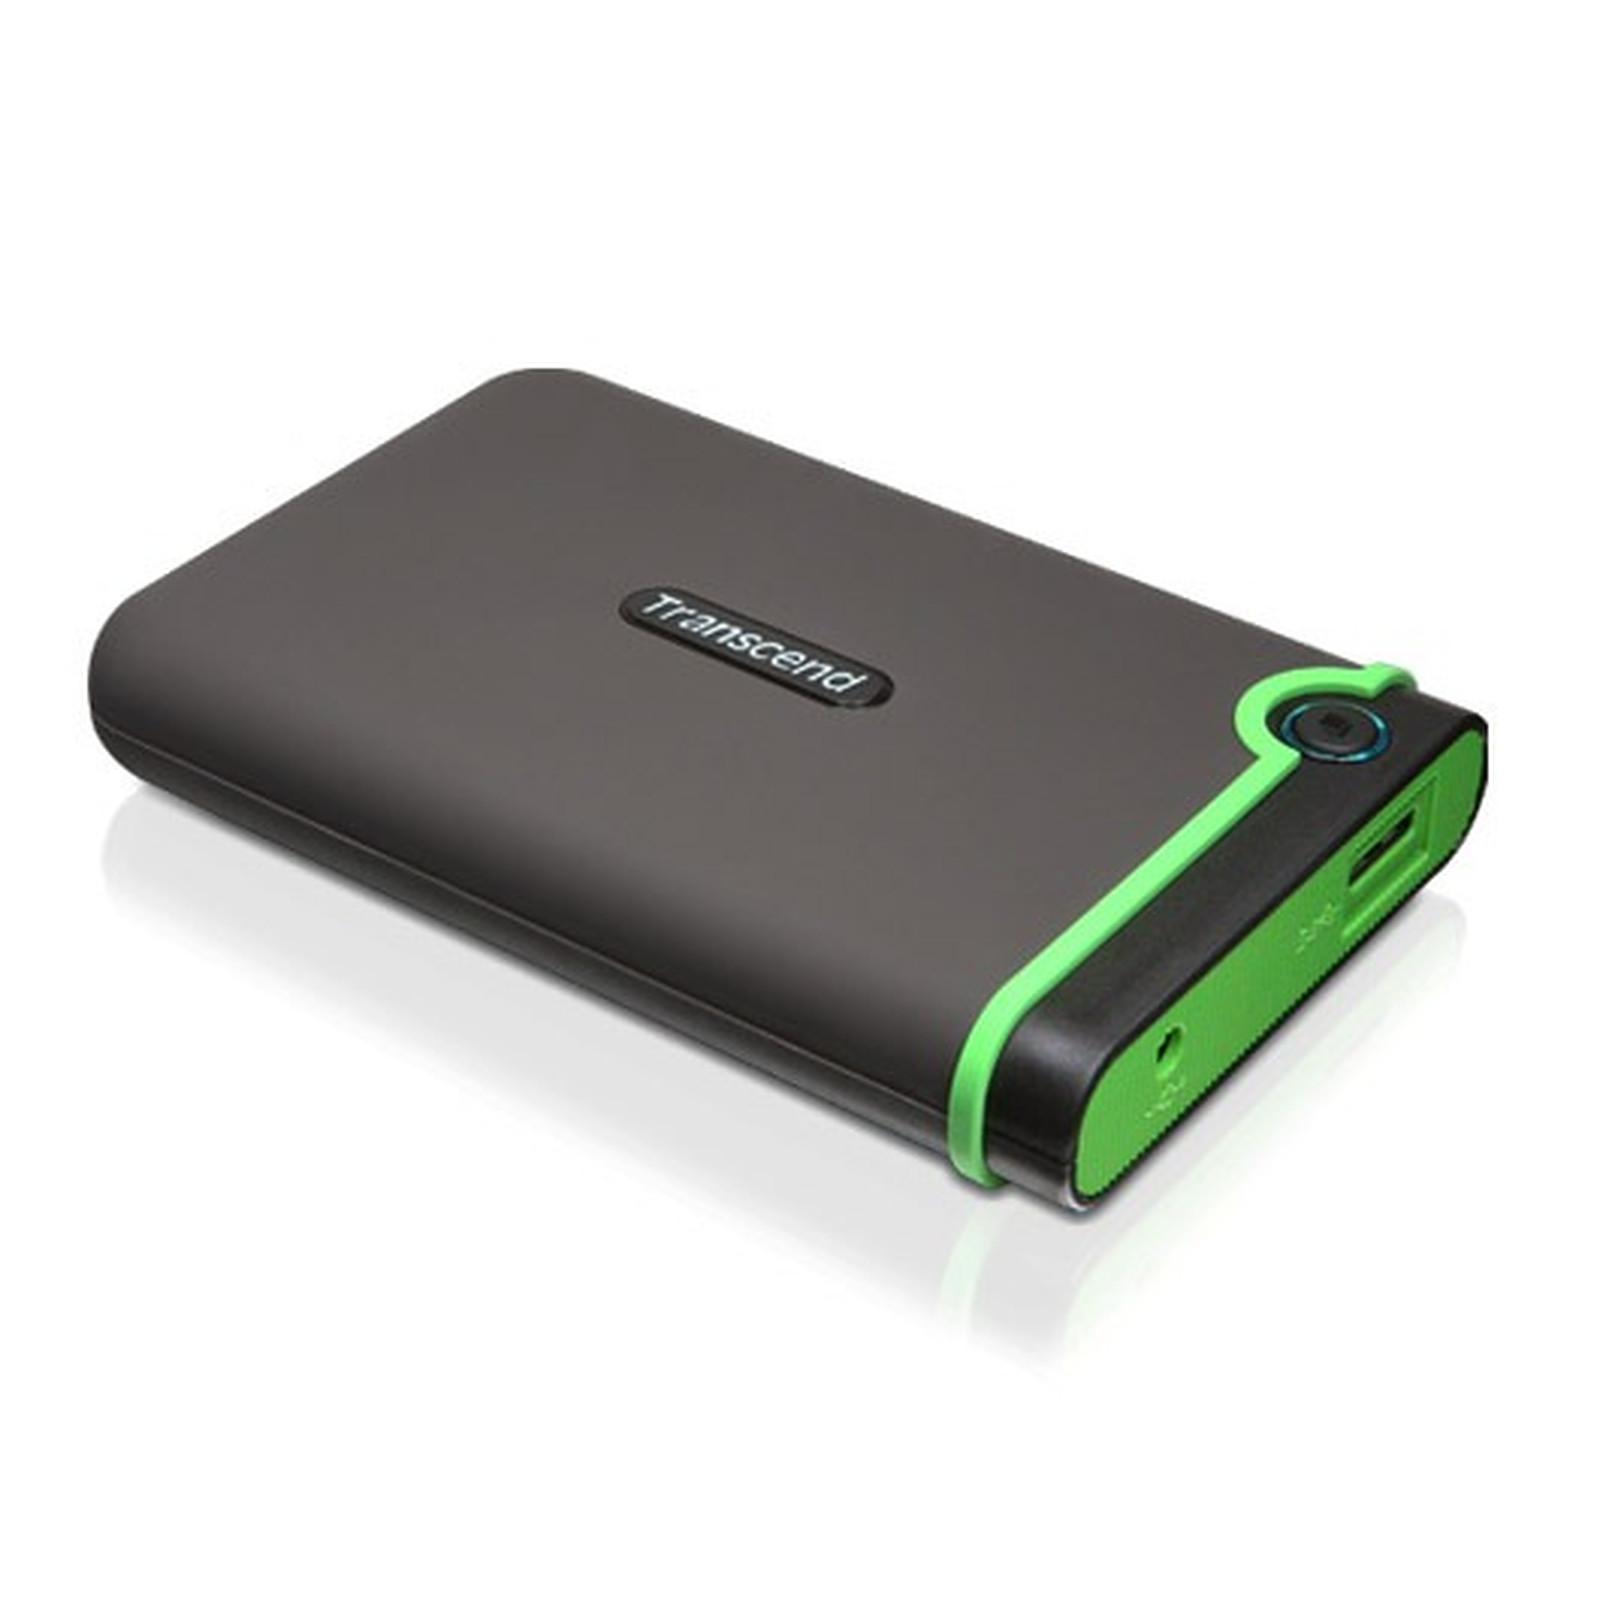 Transcend StoreJet 25M3 500 Go (USB 3.0)